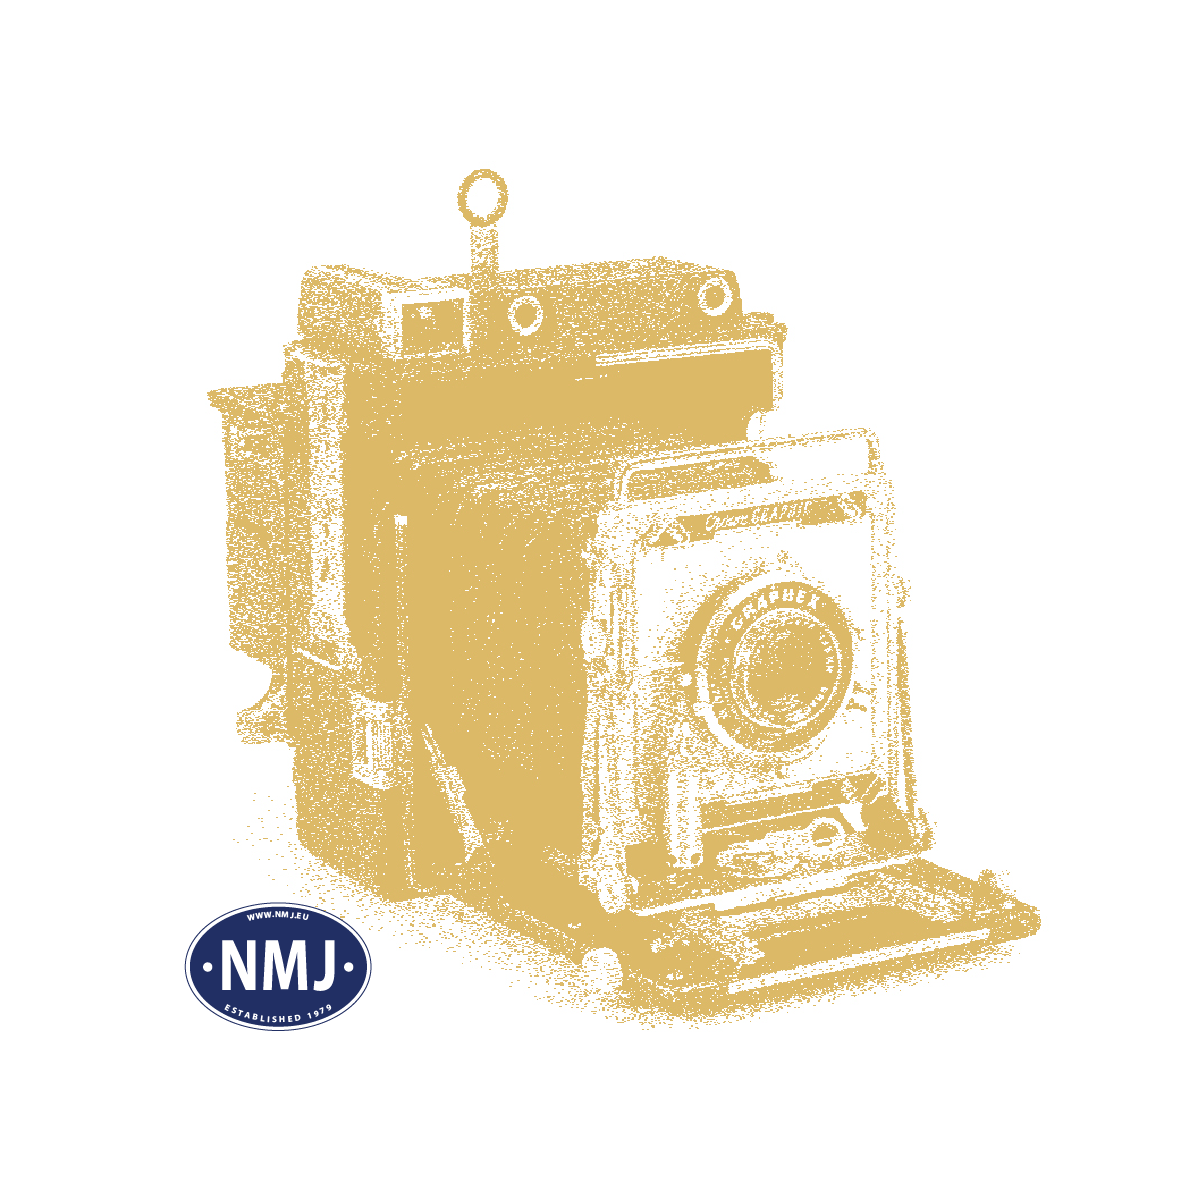 MWB-M009 - Gressmatte, Rough Medow, Sen Høst, 30 x 21 Cm